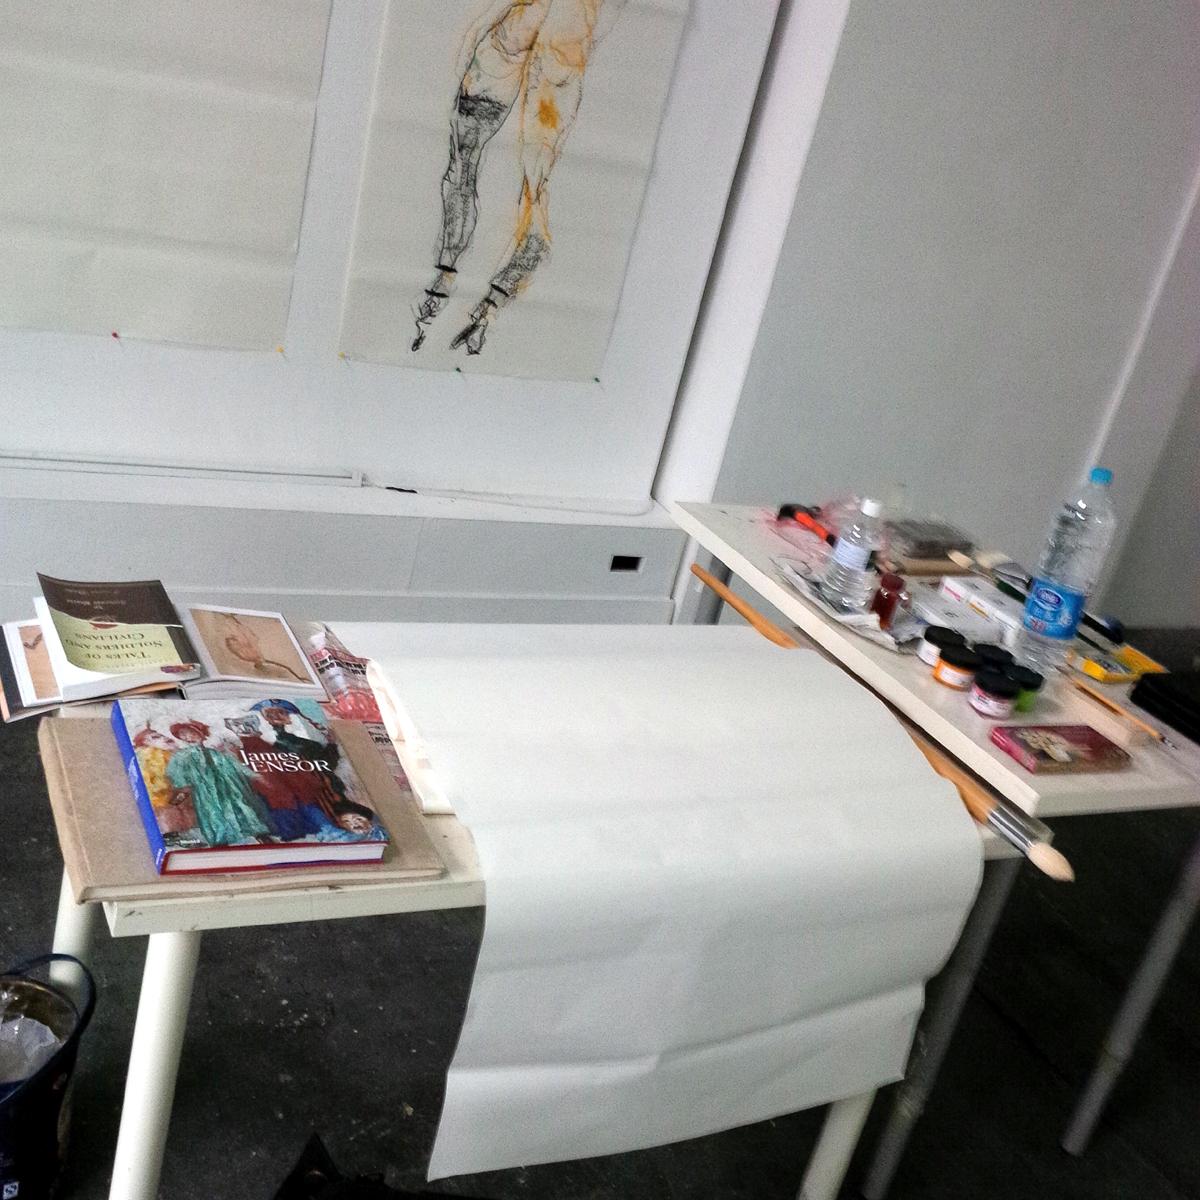 BRYAN PRILLWITZ STUDIO